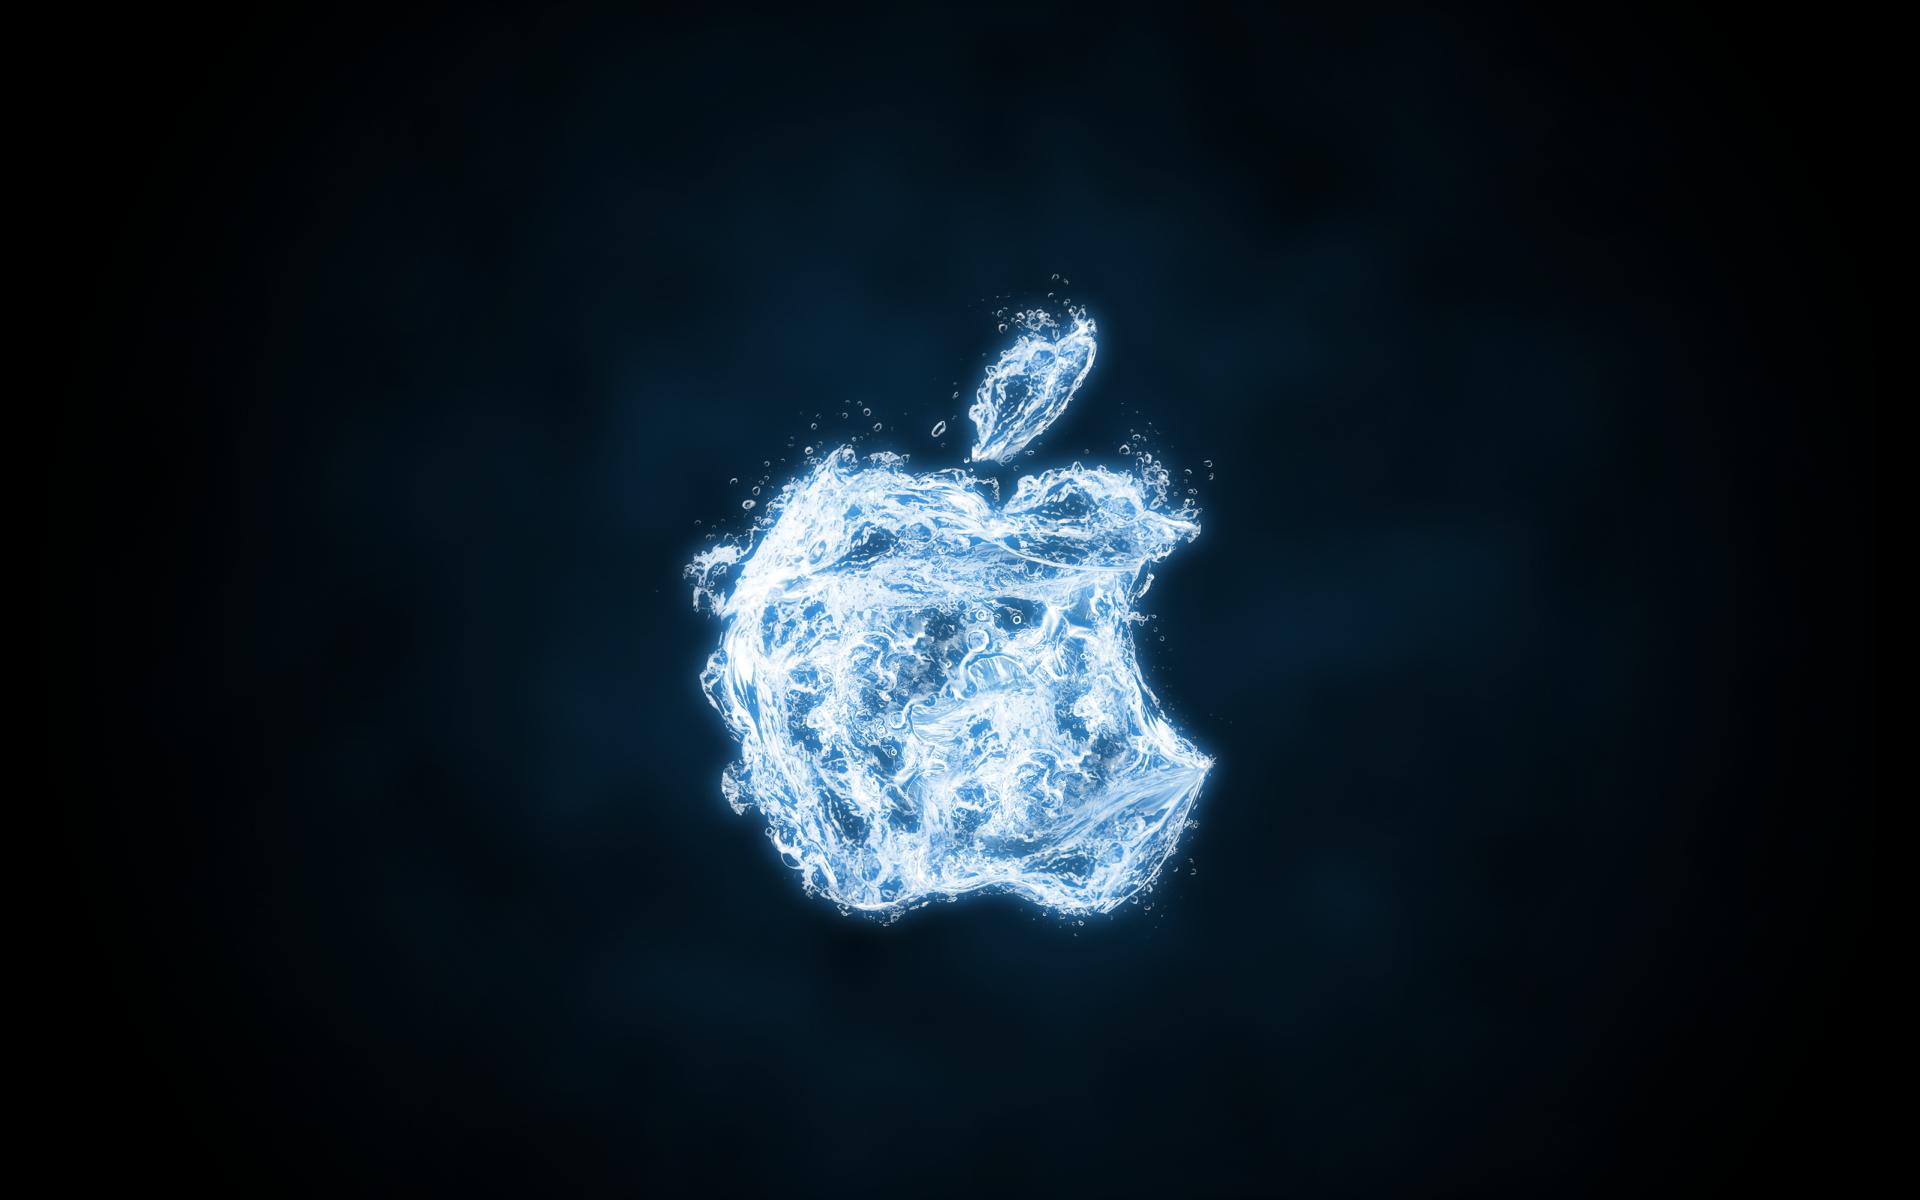 Apple Cool Water Wallpaper 9965 Wallpaper Wallpaper Screen 1920x1200